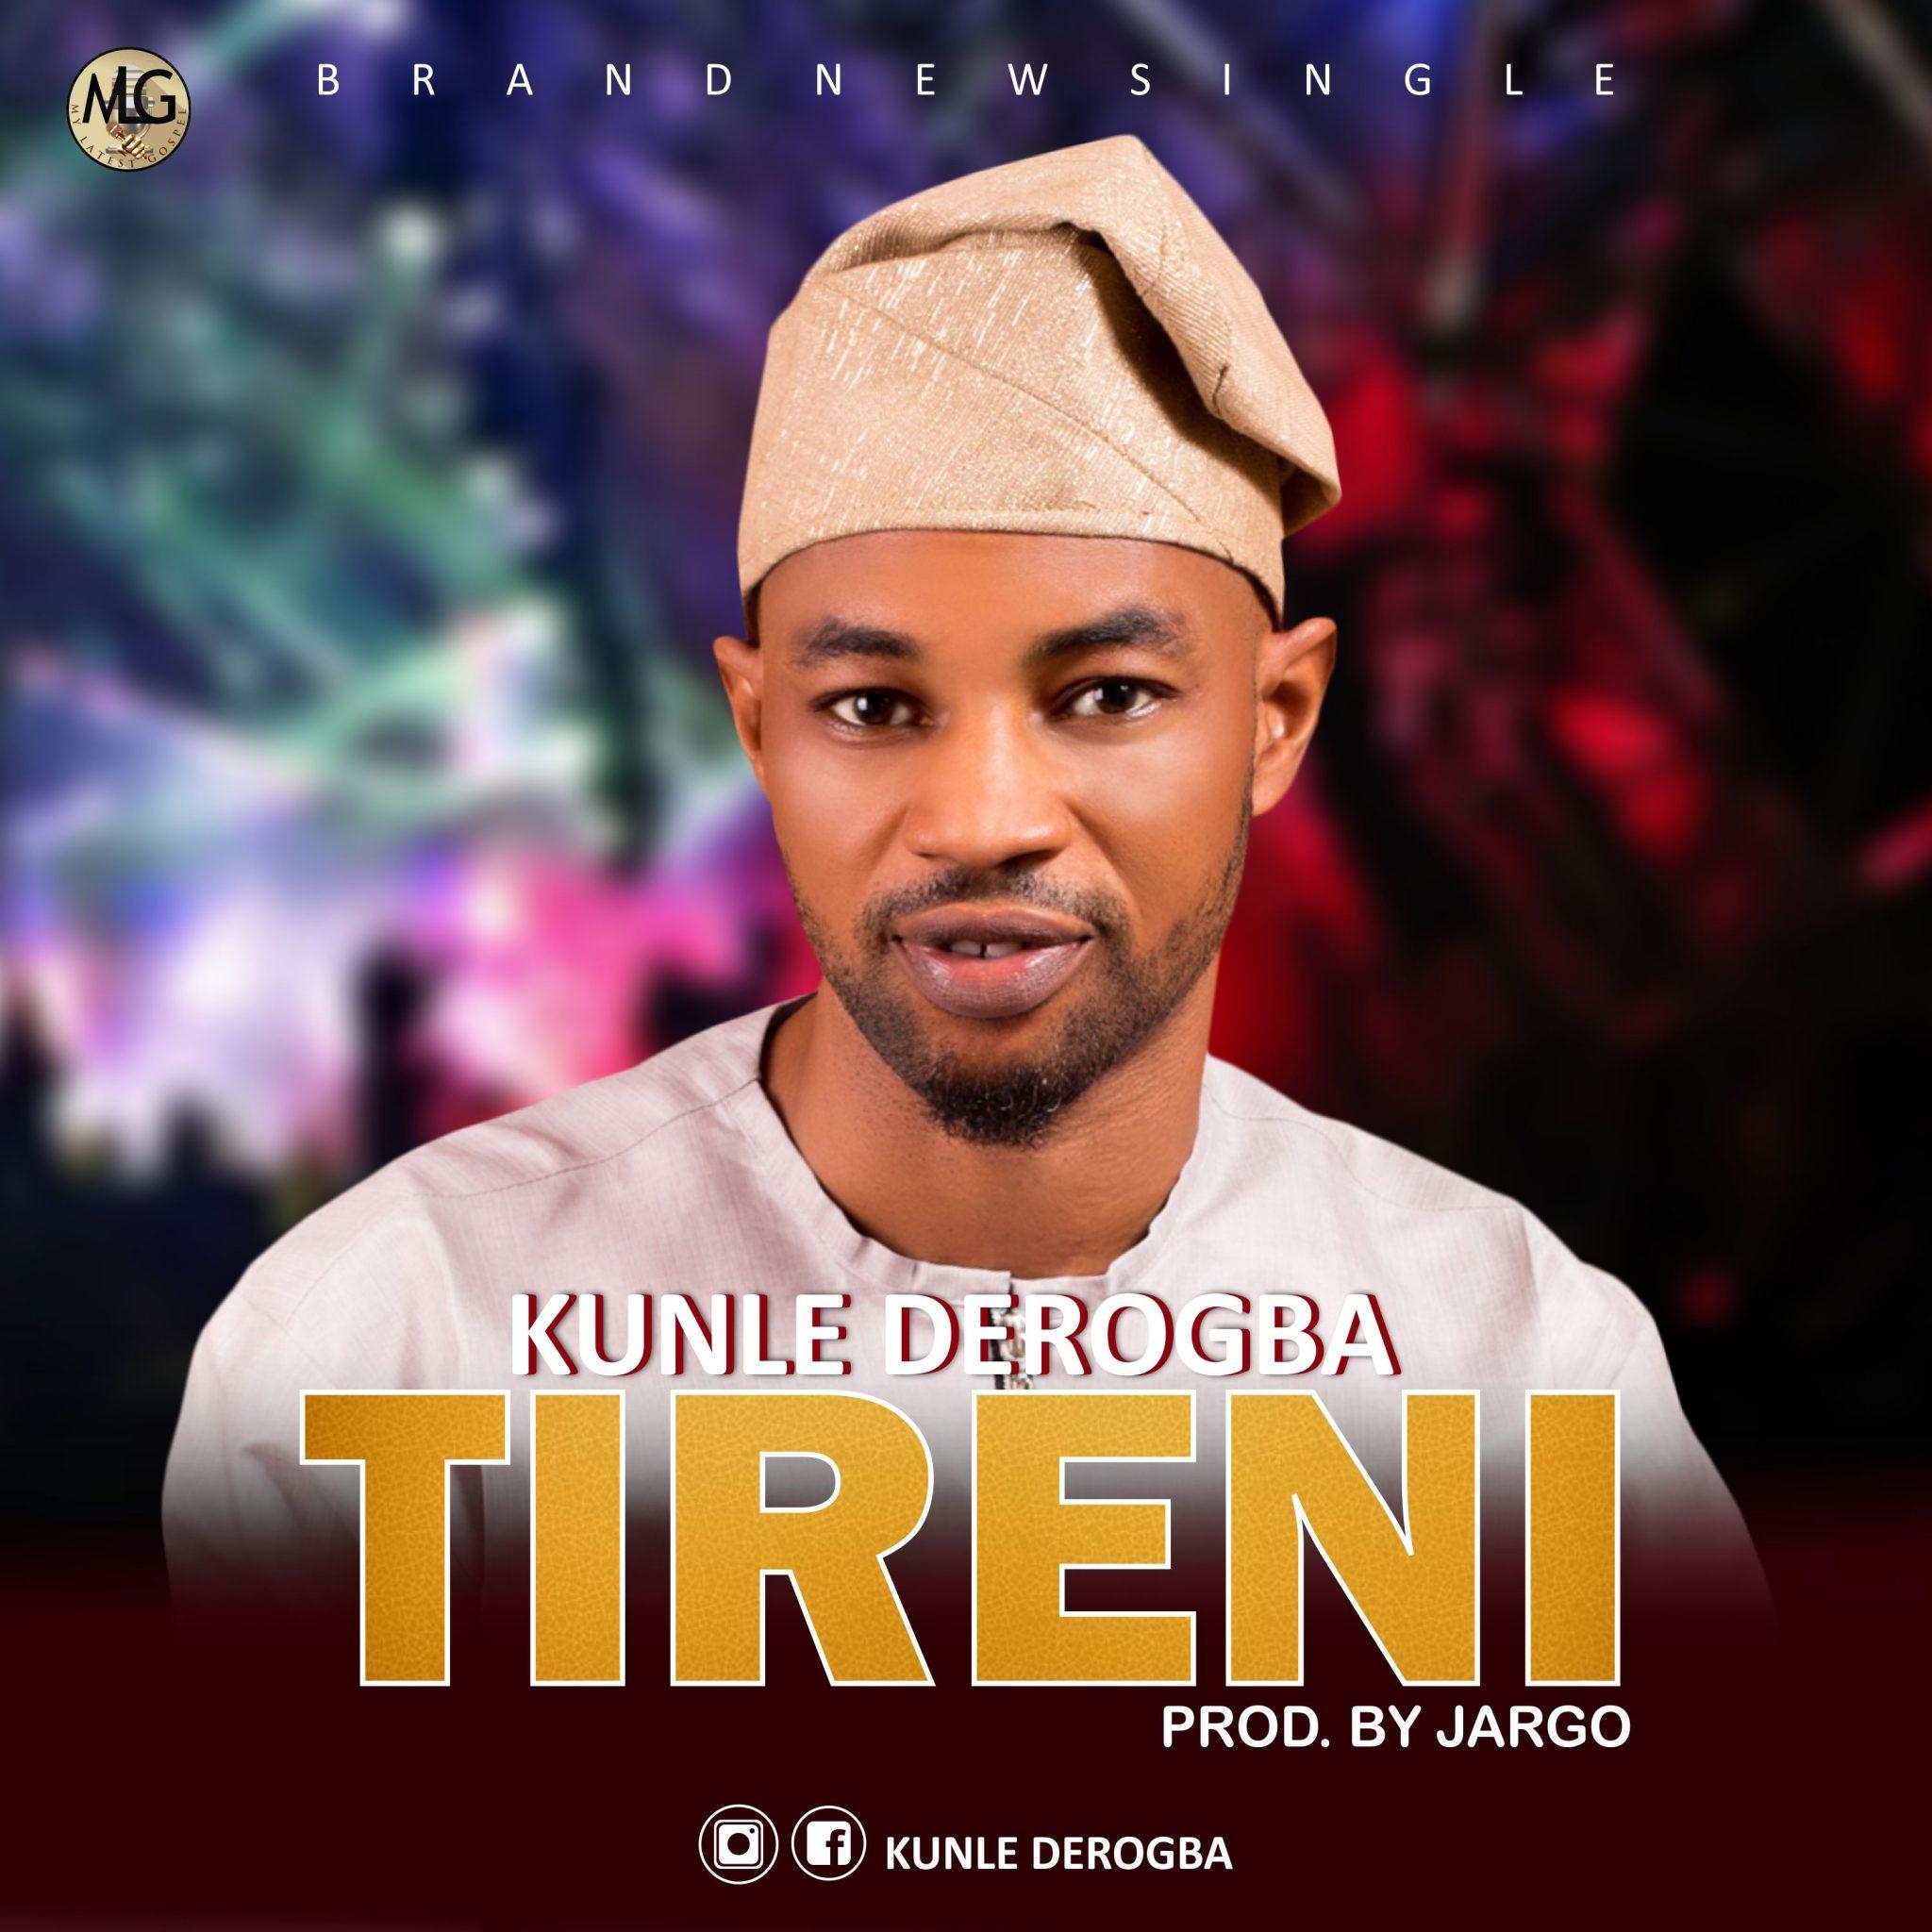 Download MP3 Kunle Derogba - Tireni